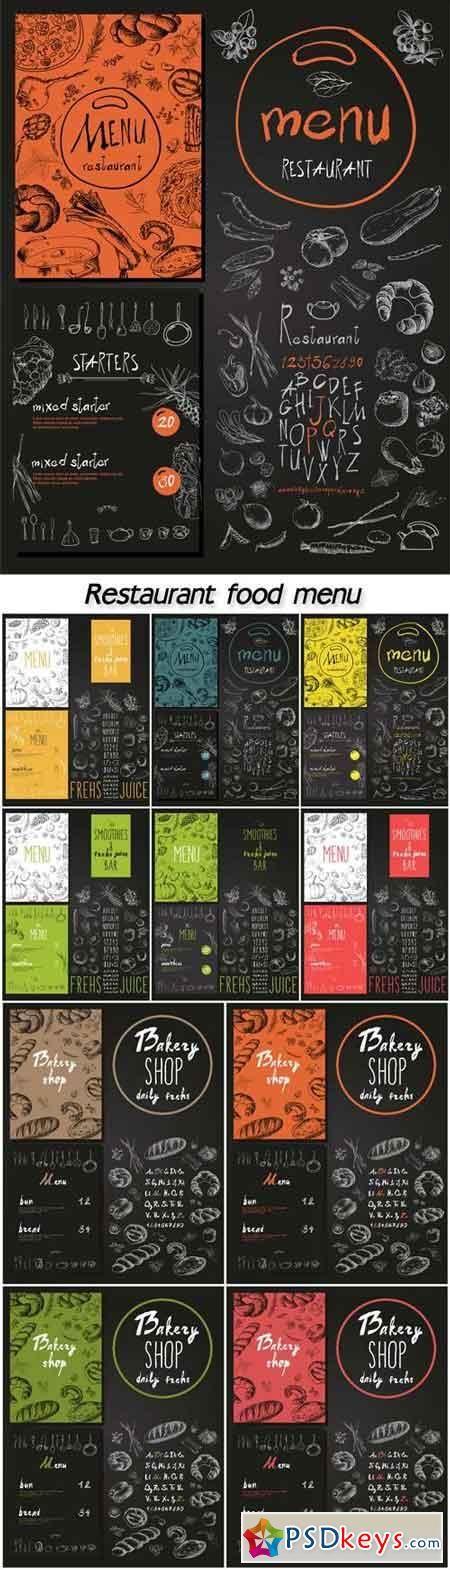 Page 17 Menu Inspiration Food Menu Design Restaurant Menu Design